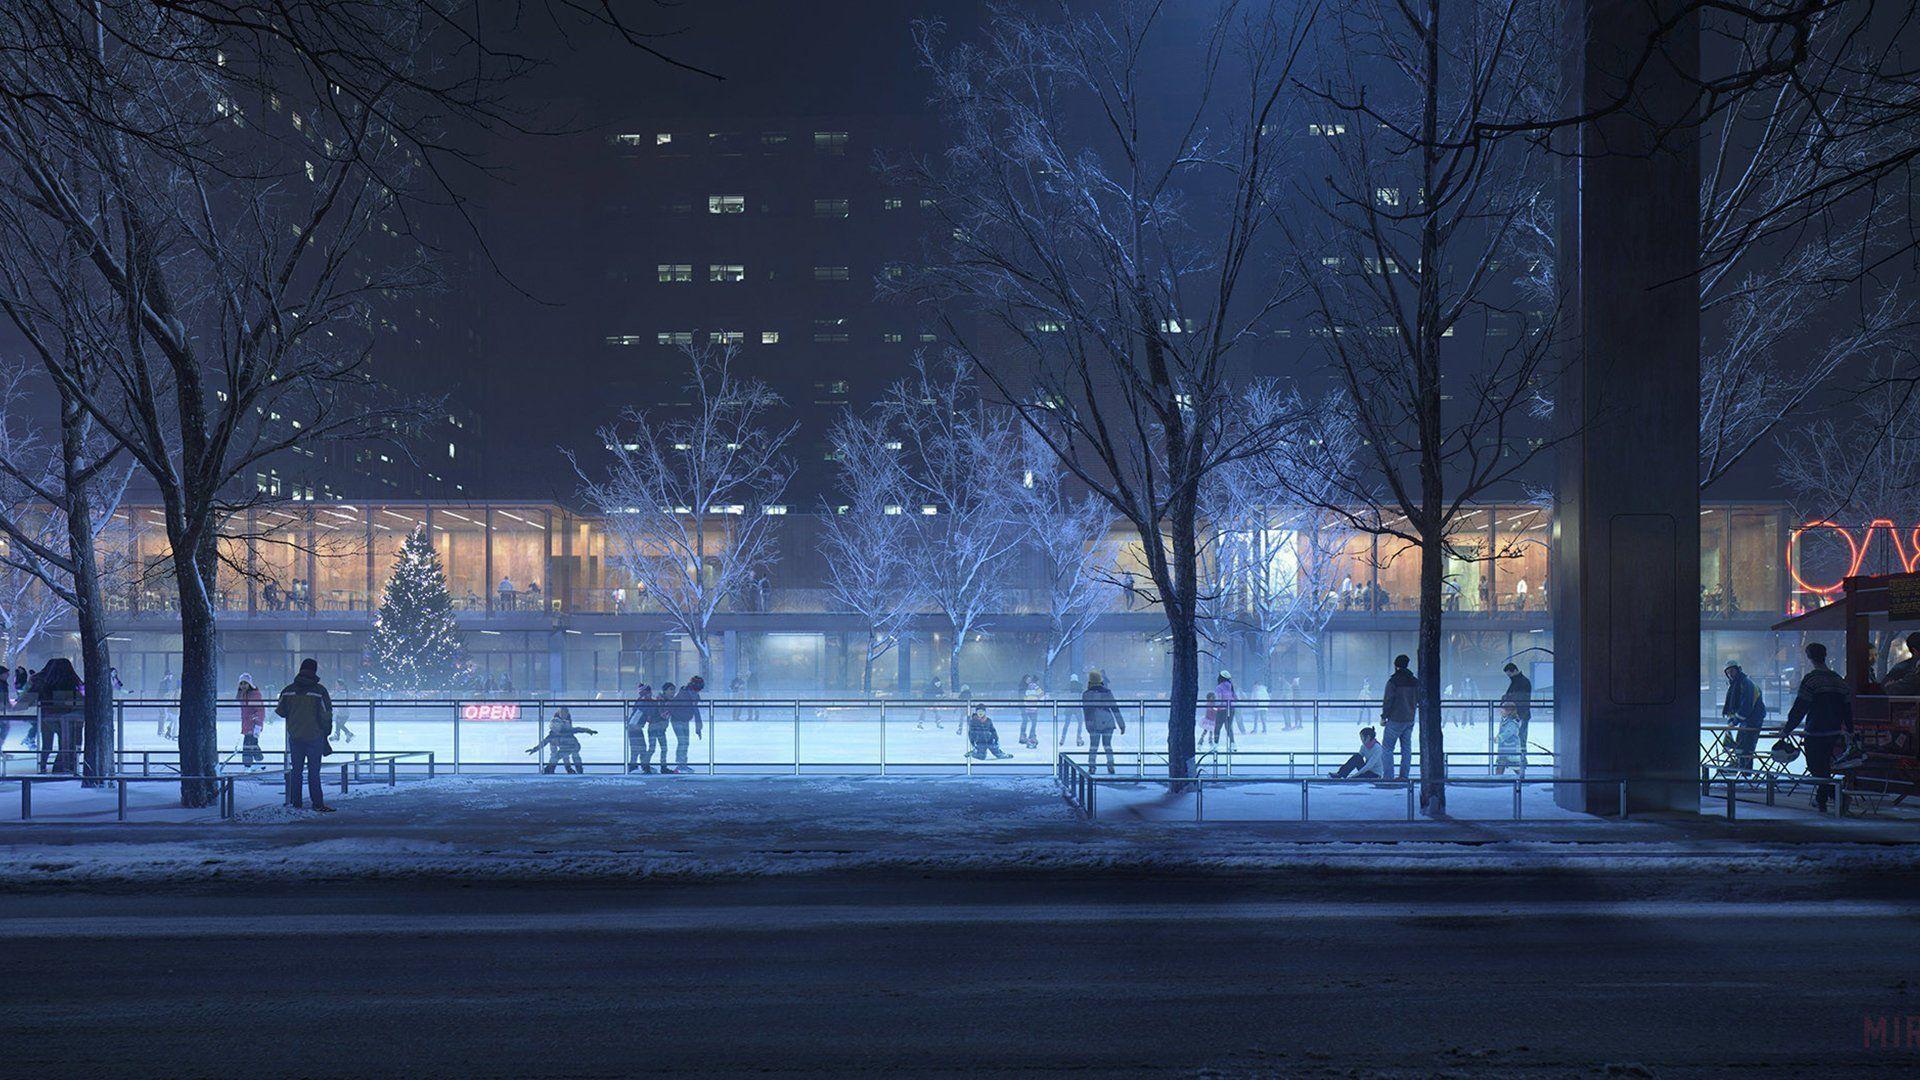 Pin By Santina Murphy On Corea Del Sur In 2020 Tree Winter Wallpaper Winter Wallpaper Anime City